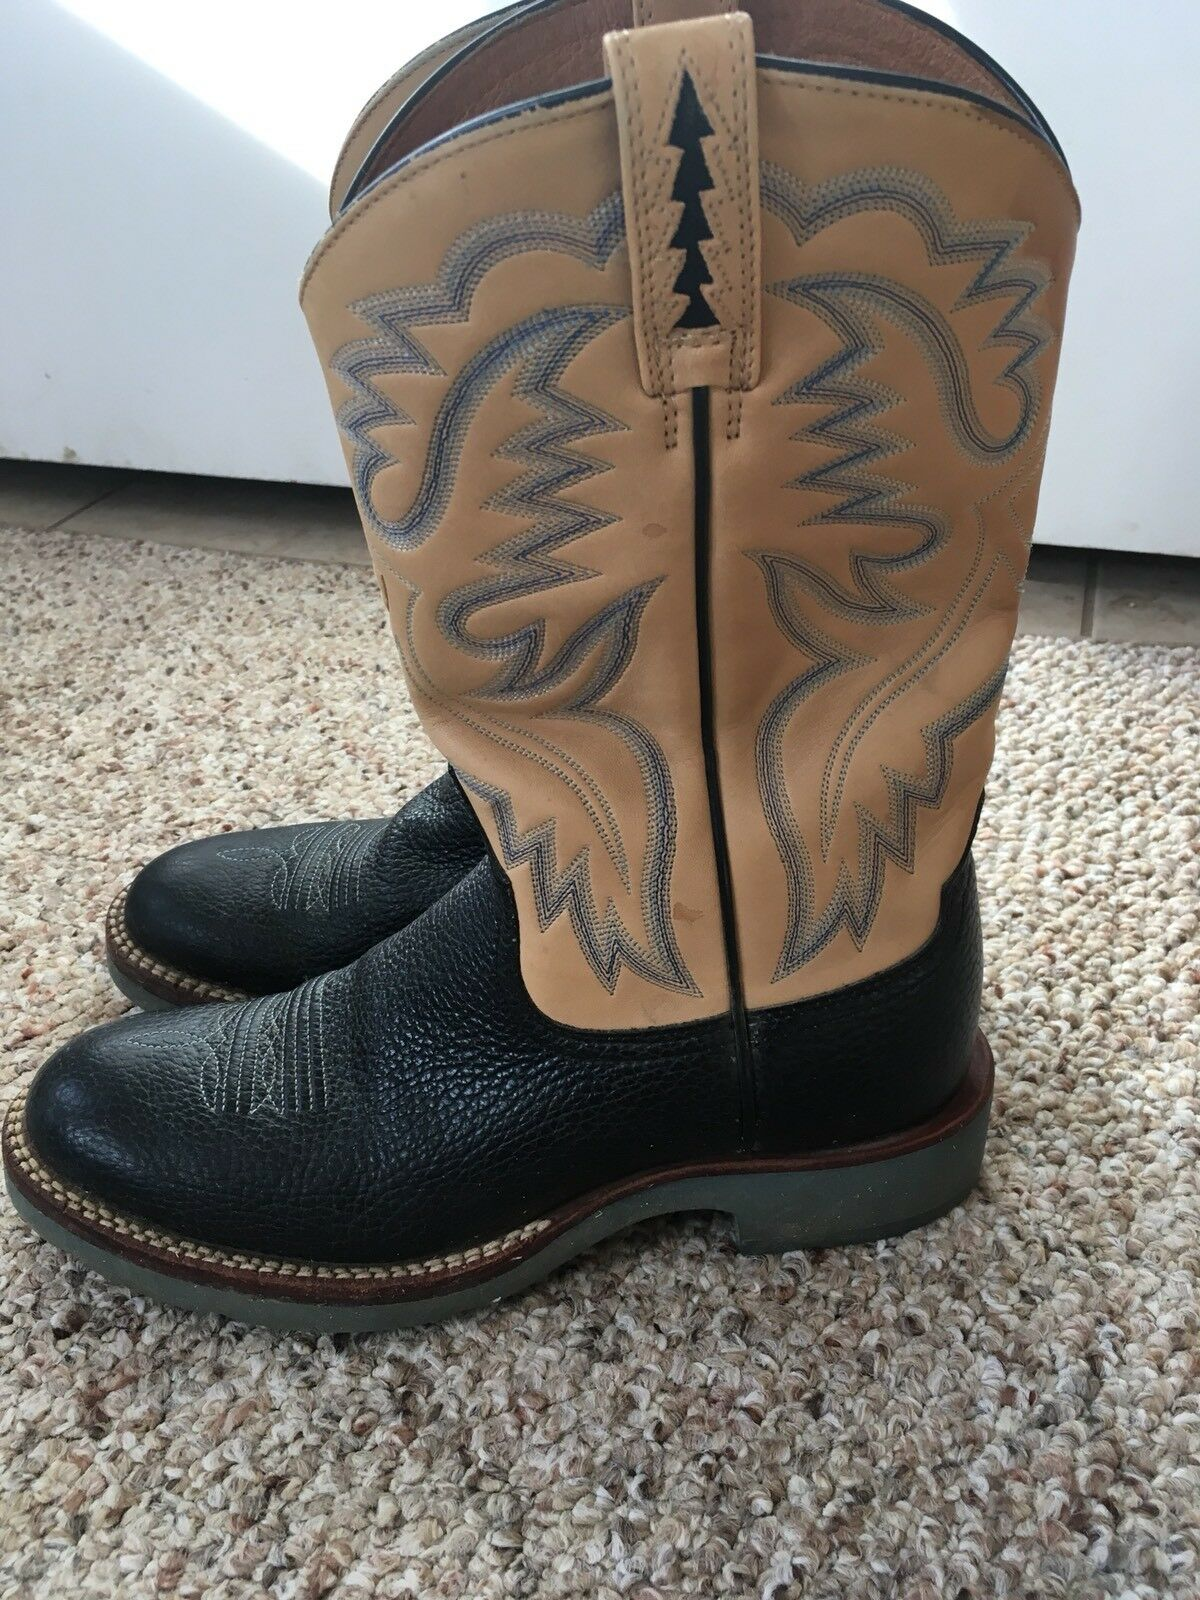 Ariat Cowboy Boots Cobalt Style 17841 Navy bluee Size 9B